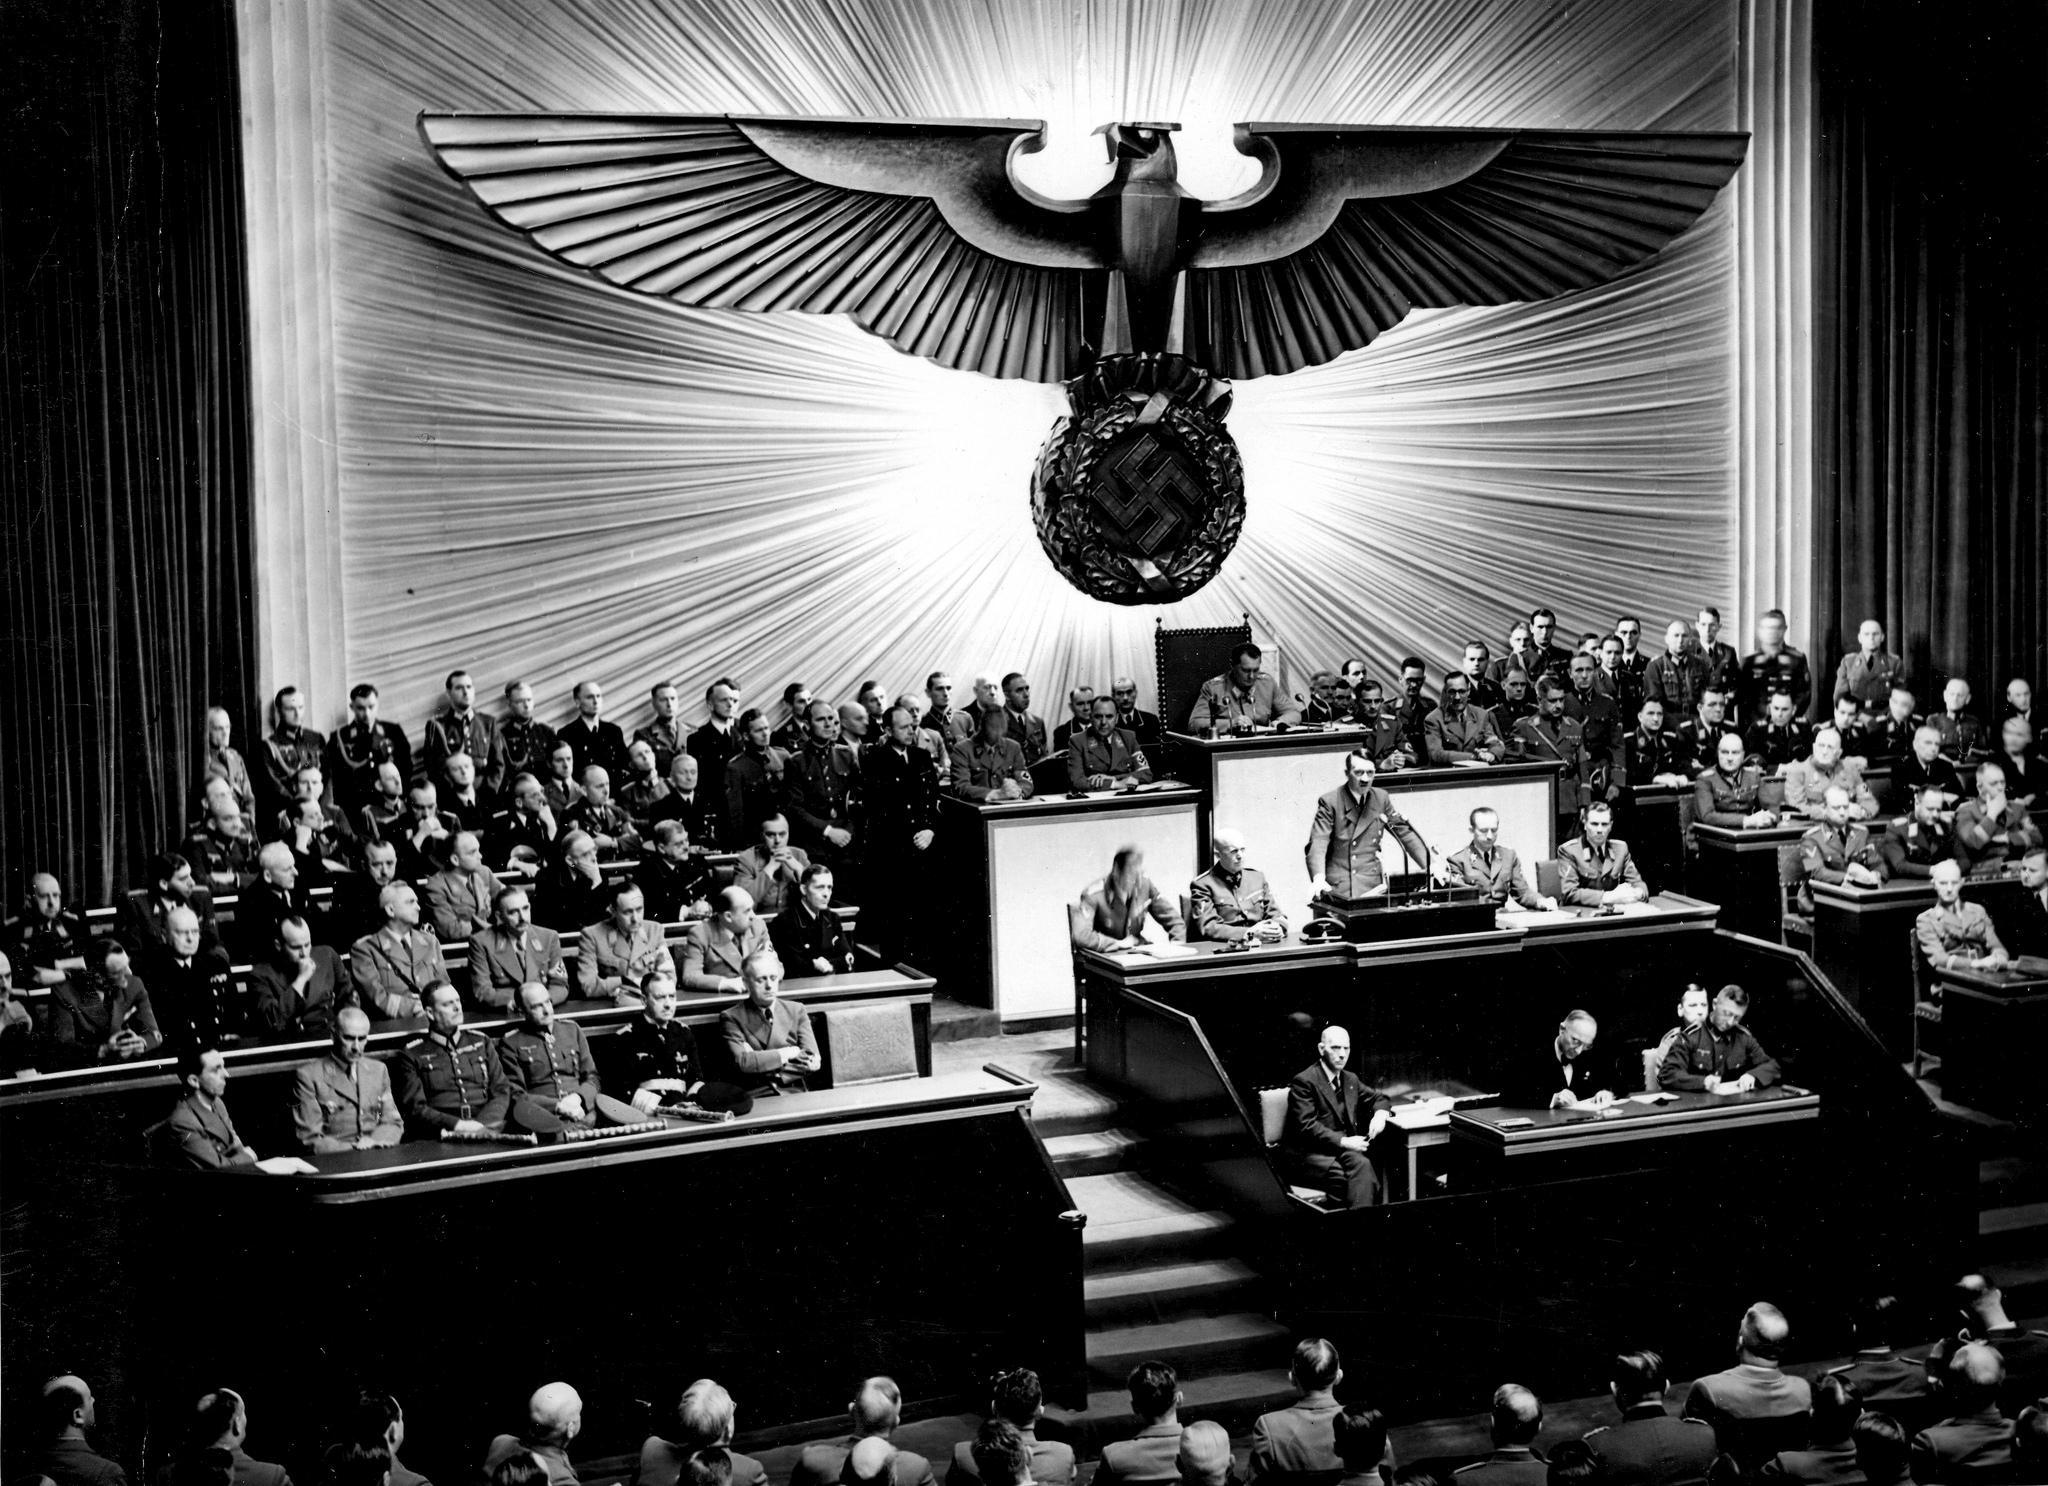 http://upload.wikimedia.org/wikipedia/commons/b/b7/Bundesarchiv_Bild_183-1987-0703-507%2C_Berlin%2C_Reichstagssitzung%2C_Rede_Adolf_Hitler.jpg